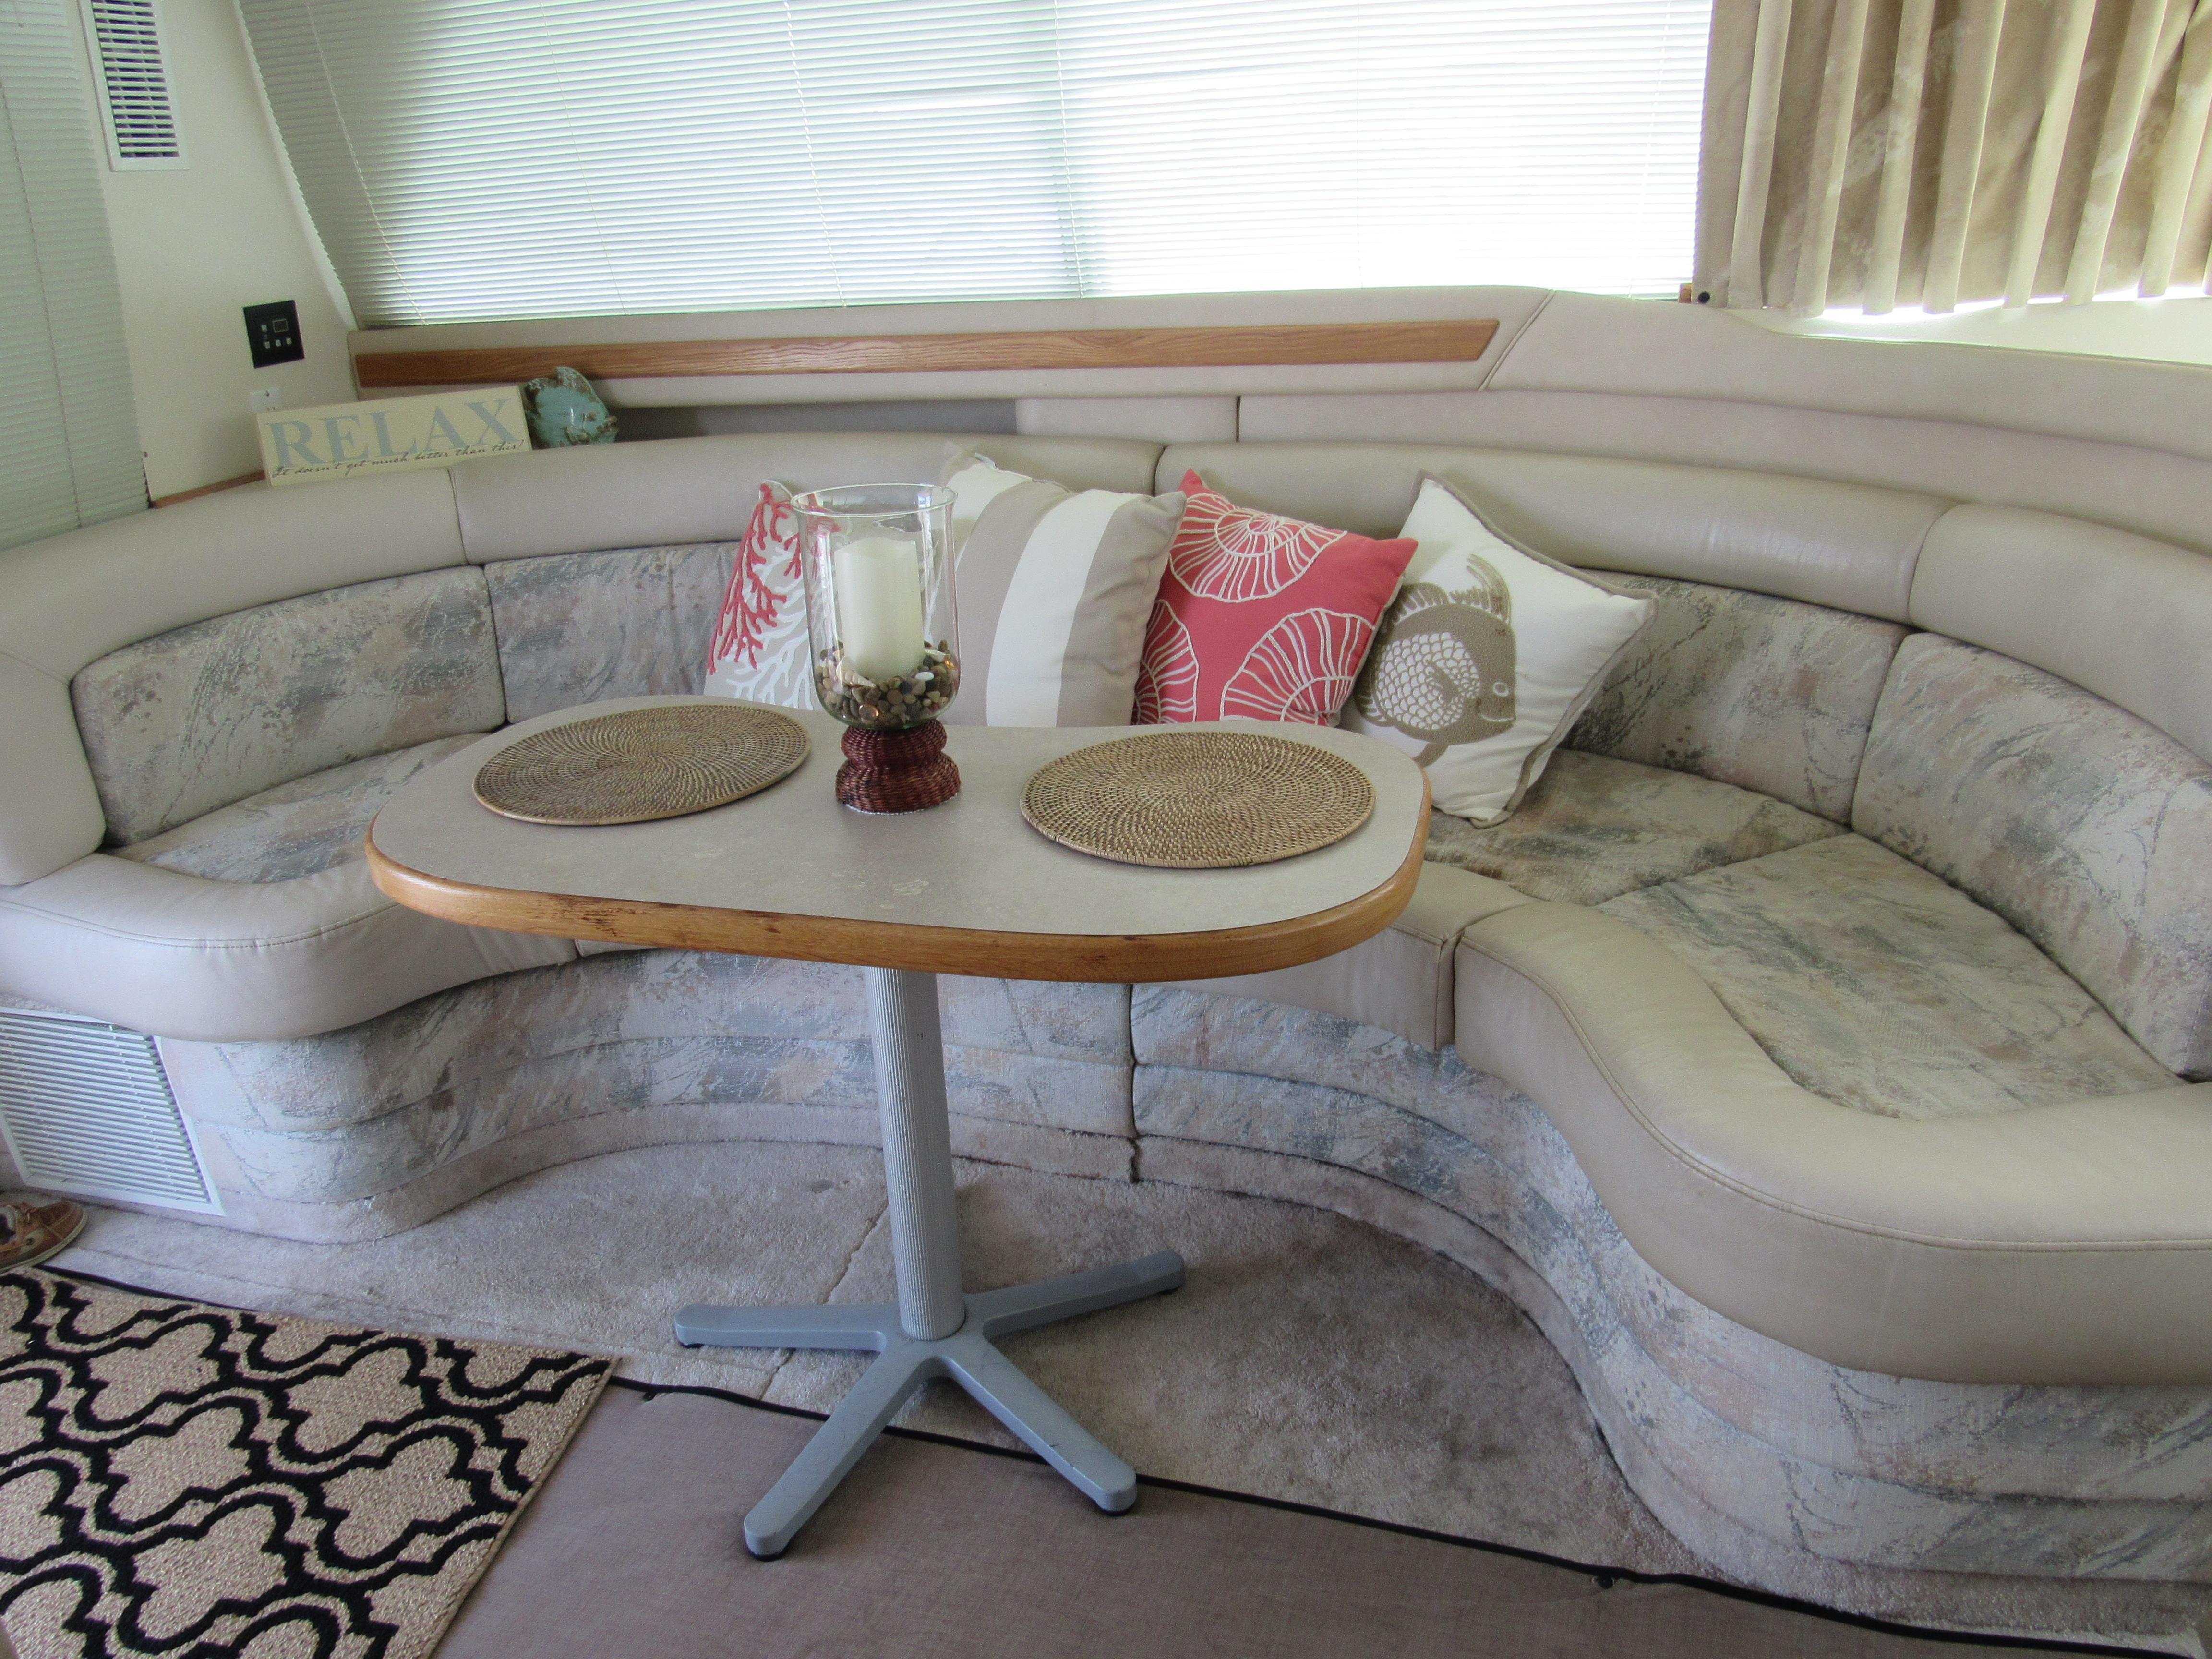 Salon Sofa and Table